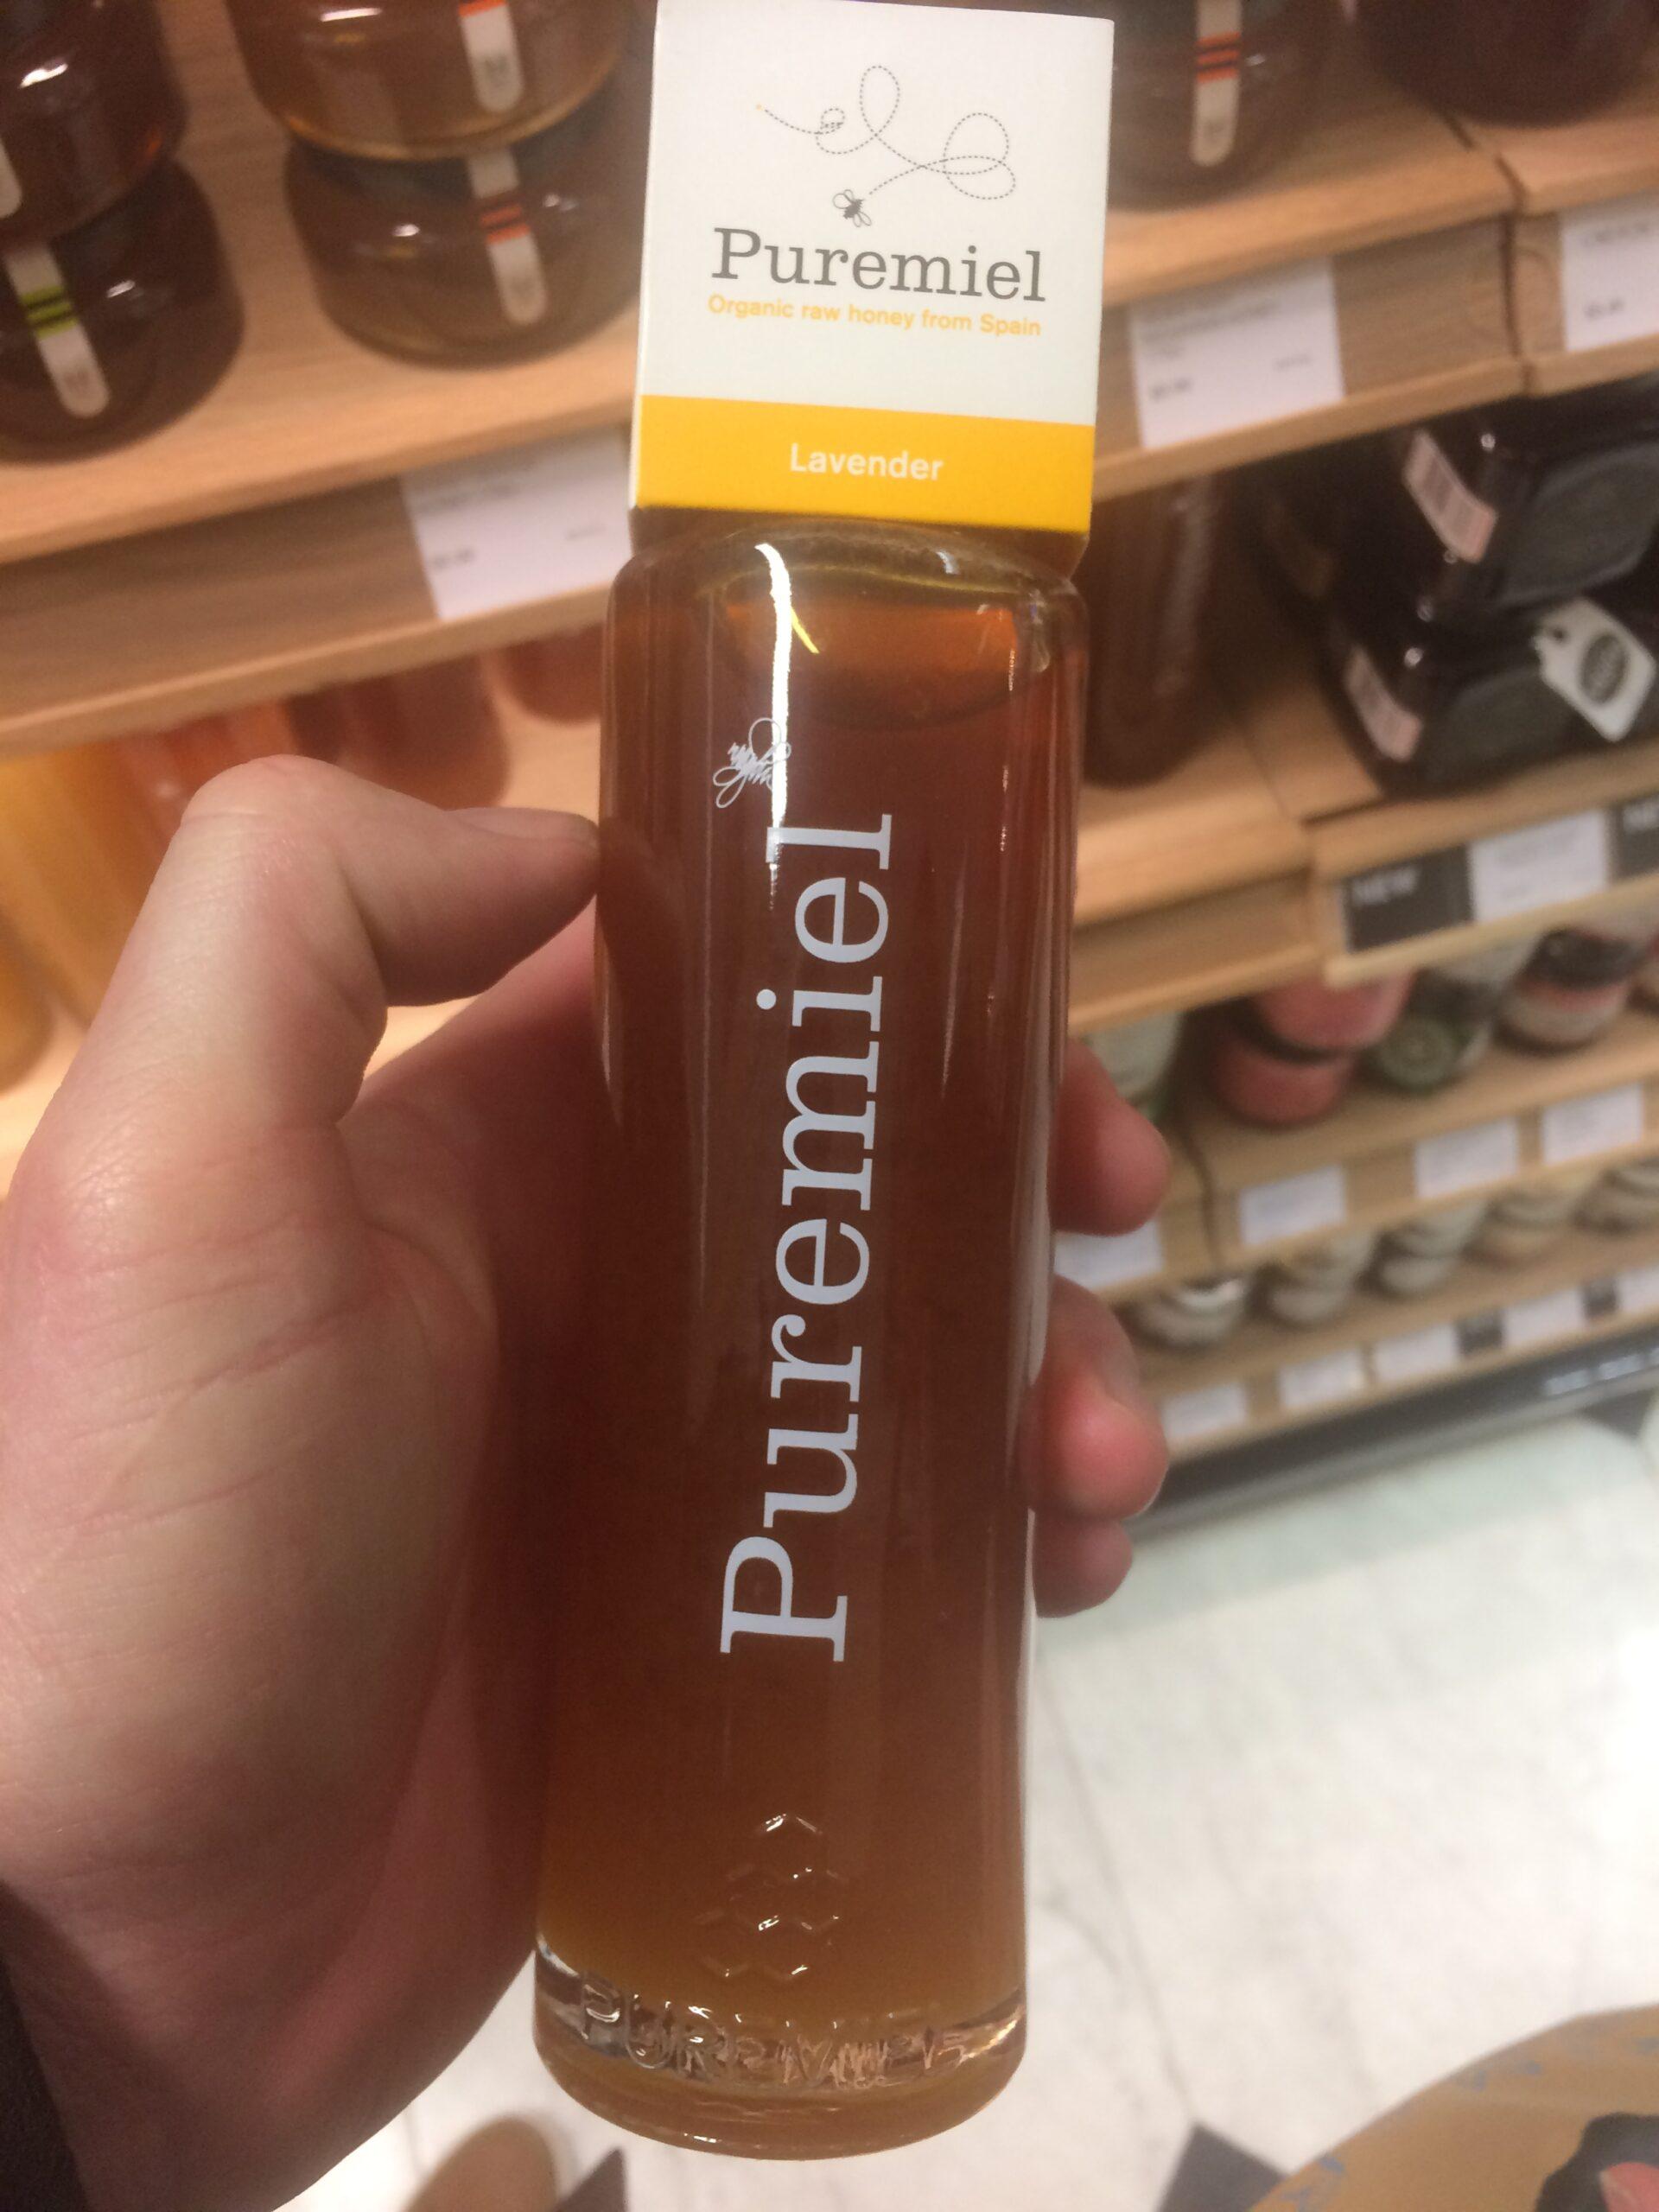 Harrods honungsprodukter